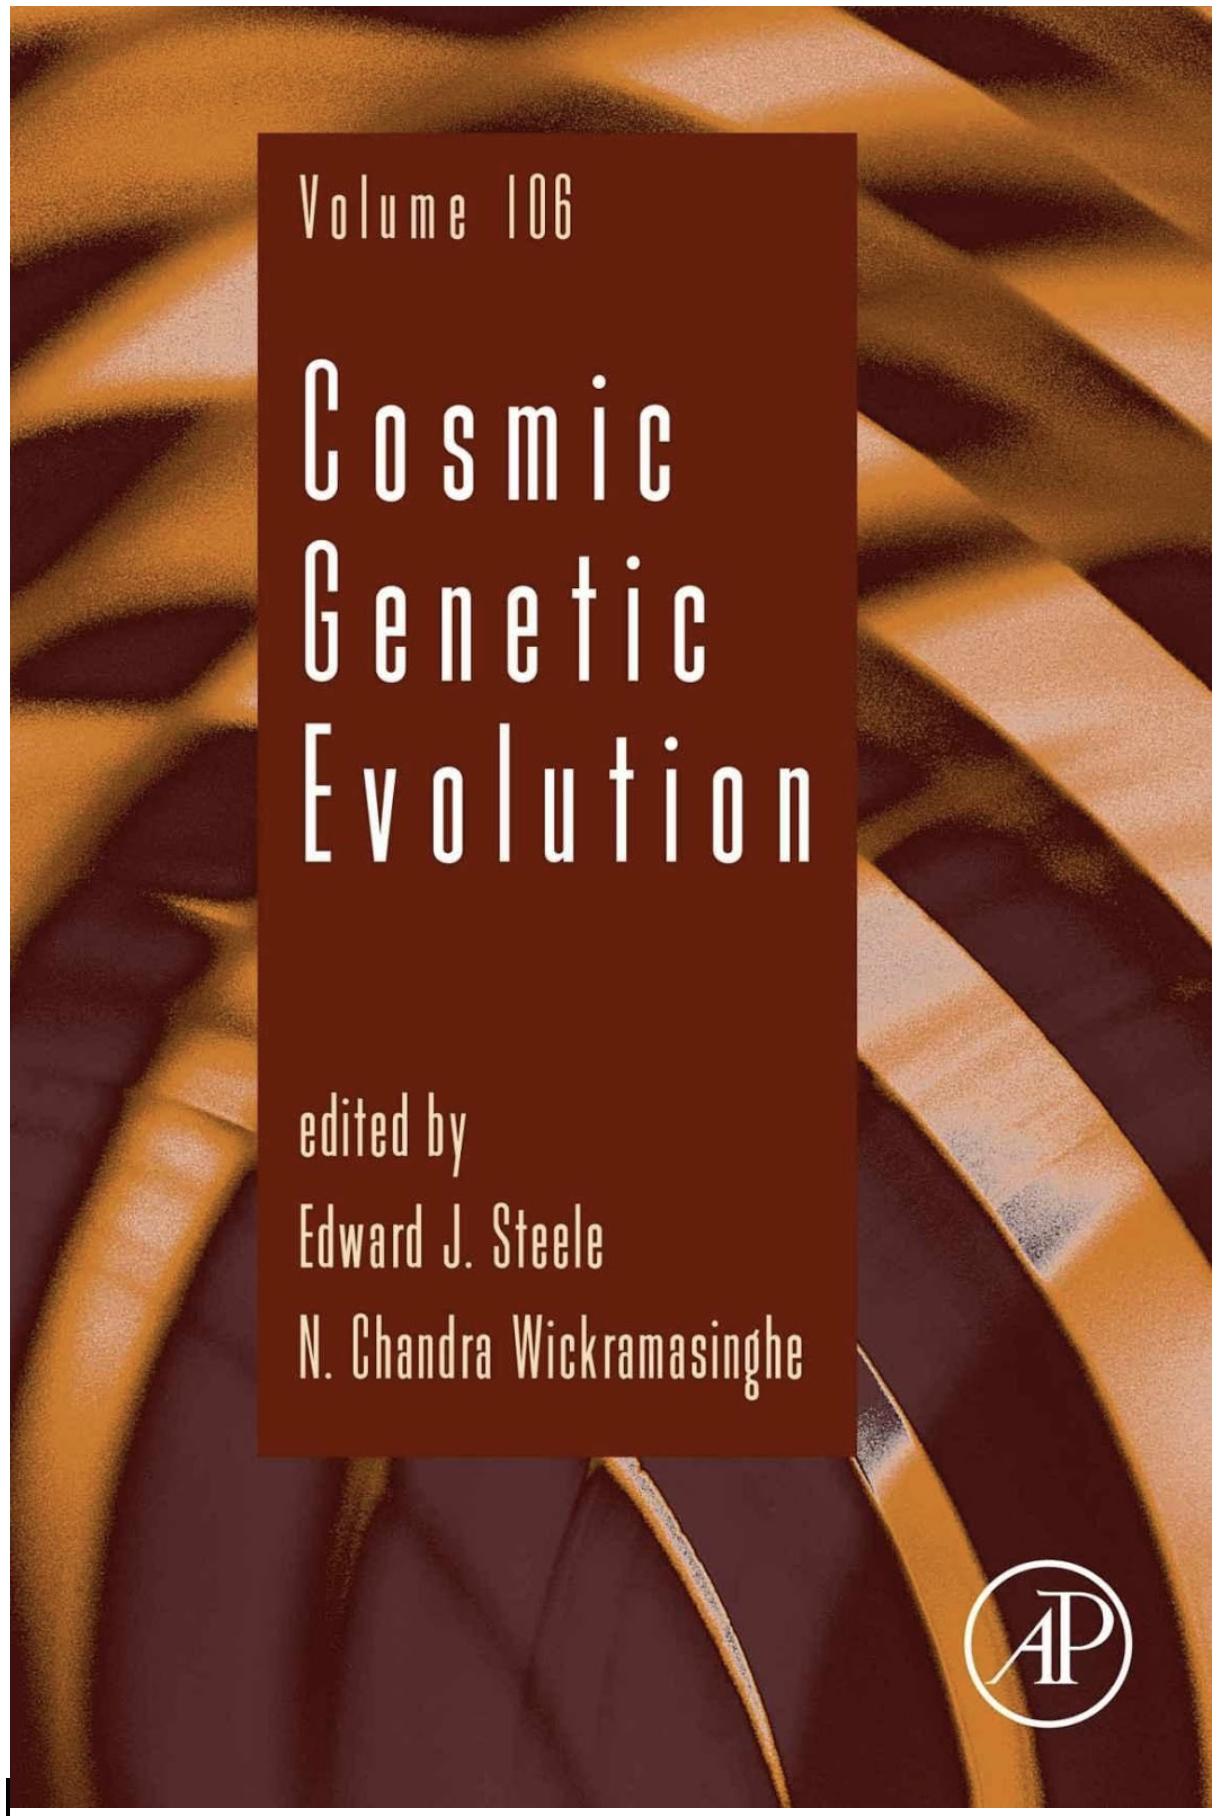 COSMIC GENETIC EVOLUTION